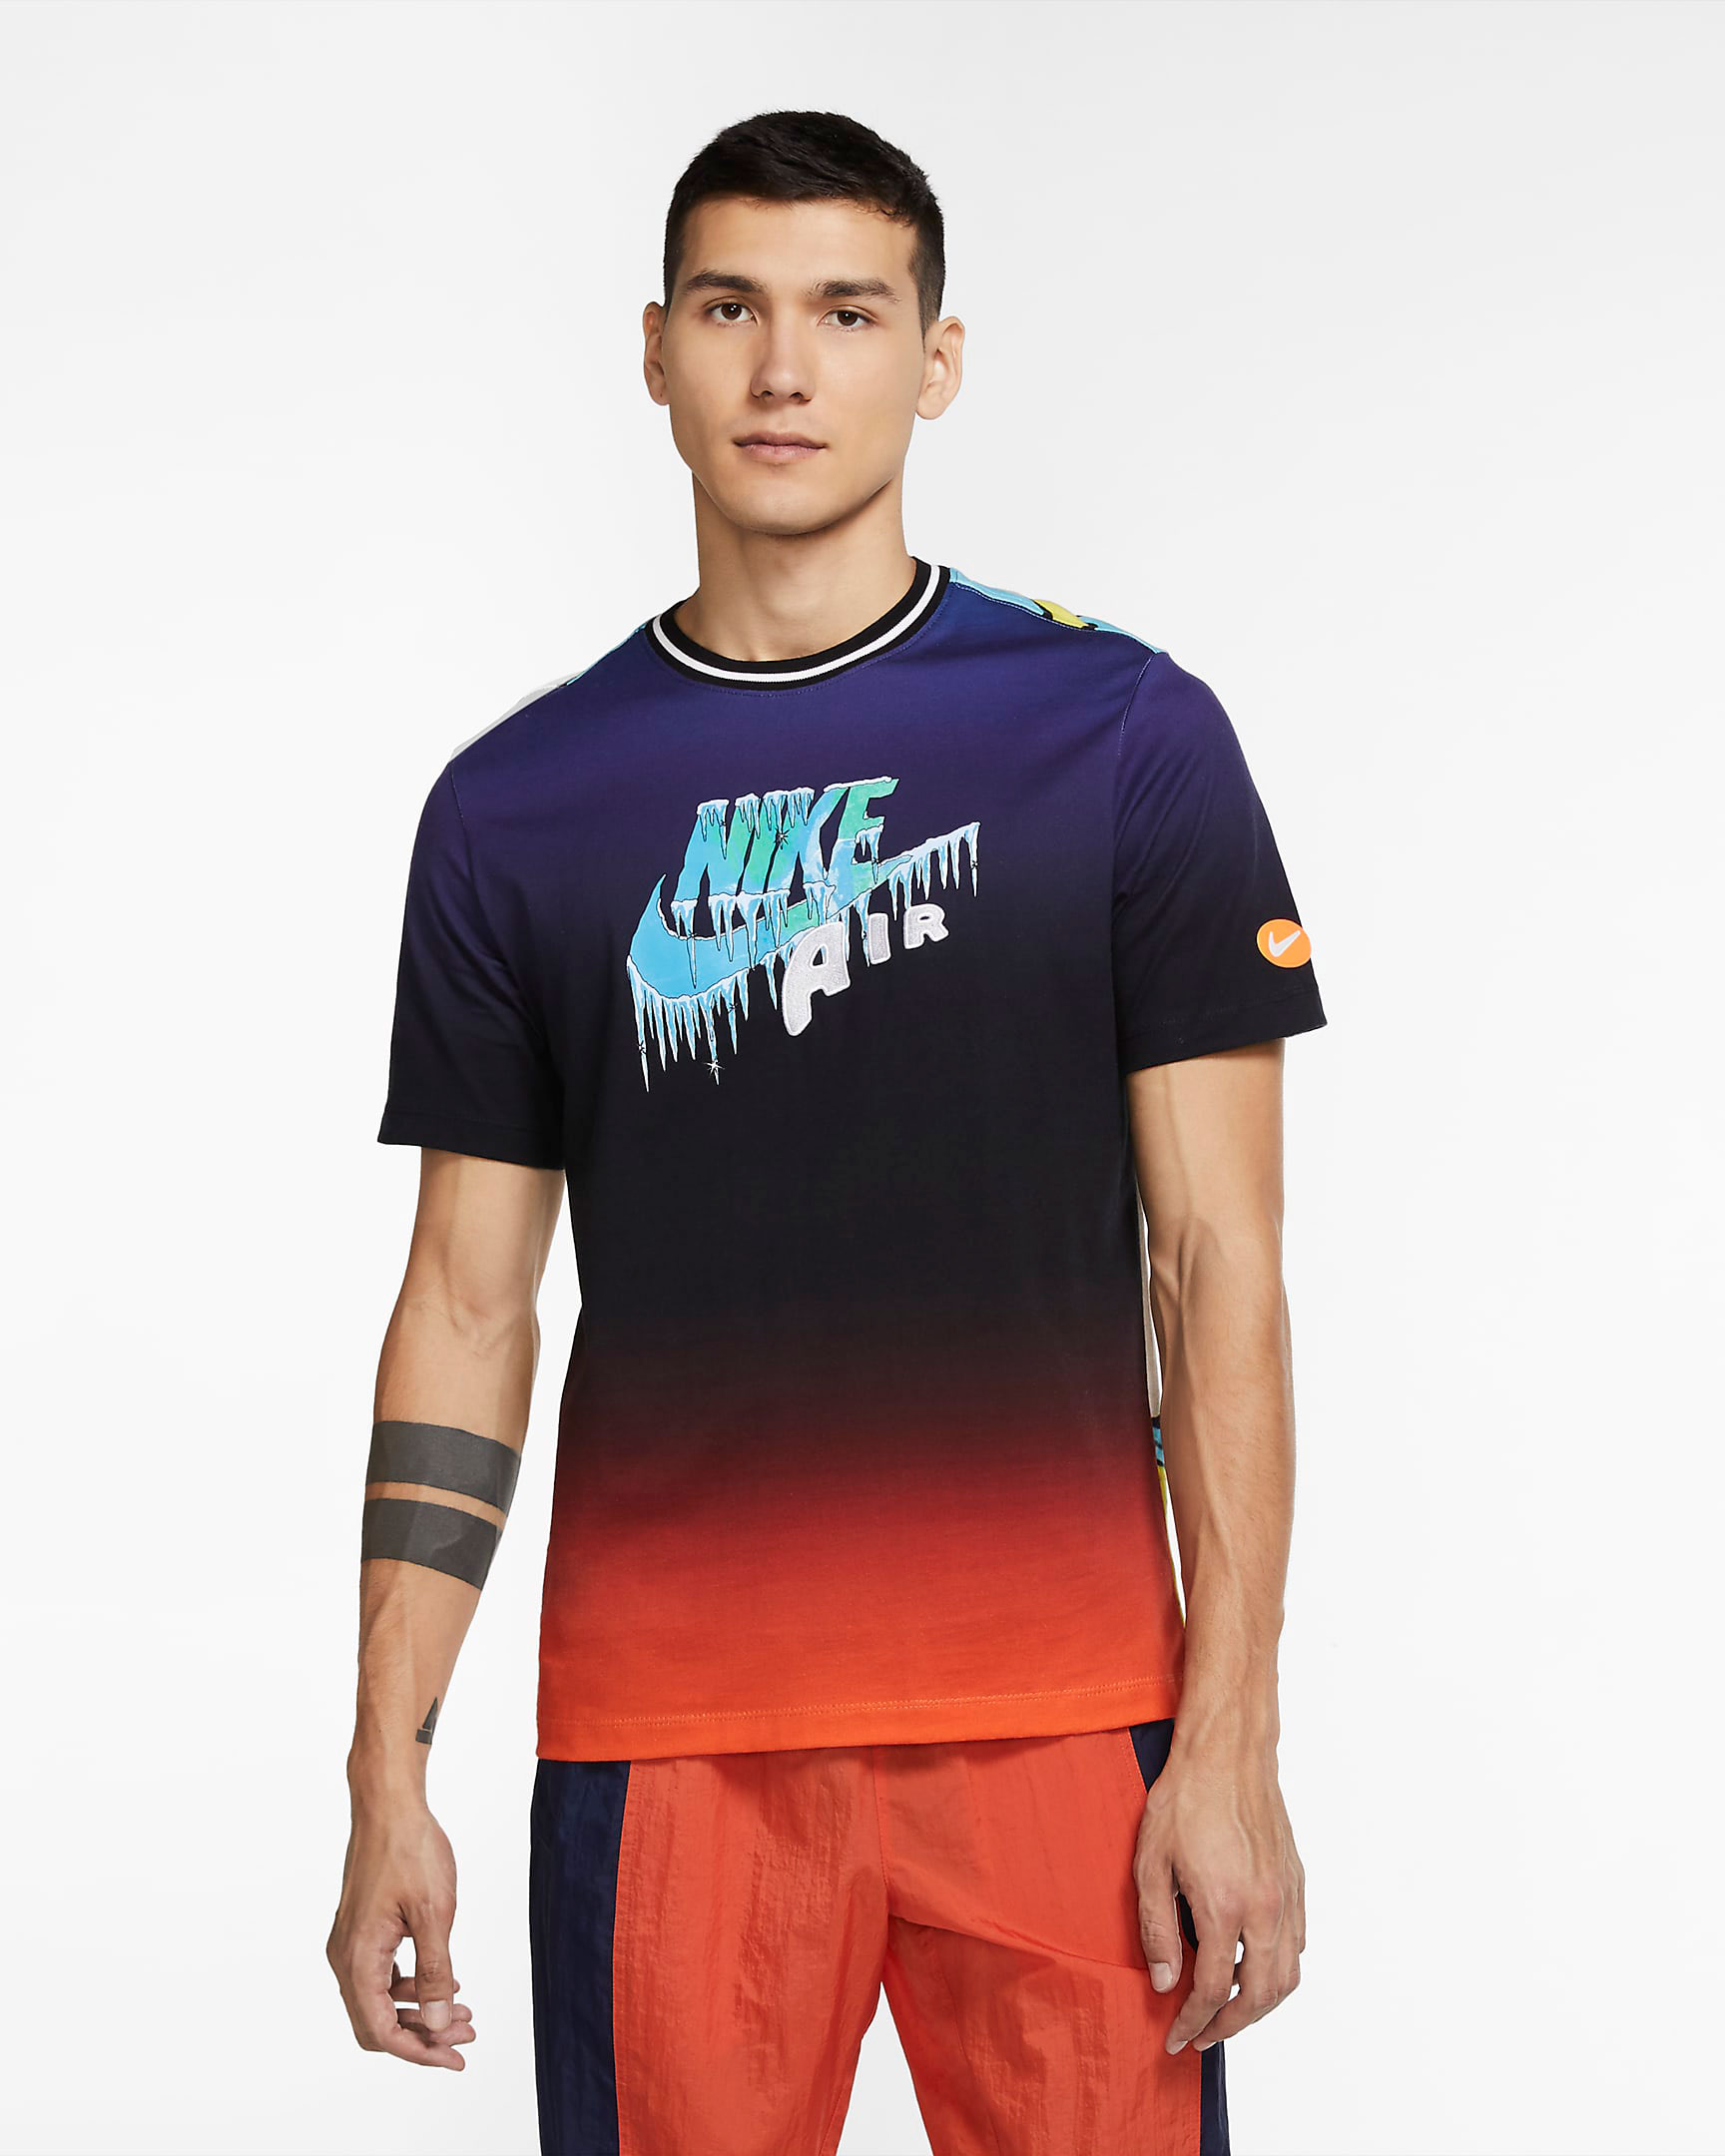 nike-sportswear-icy-drip-shirt-black-1